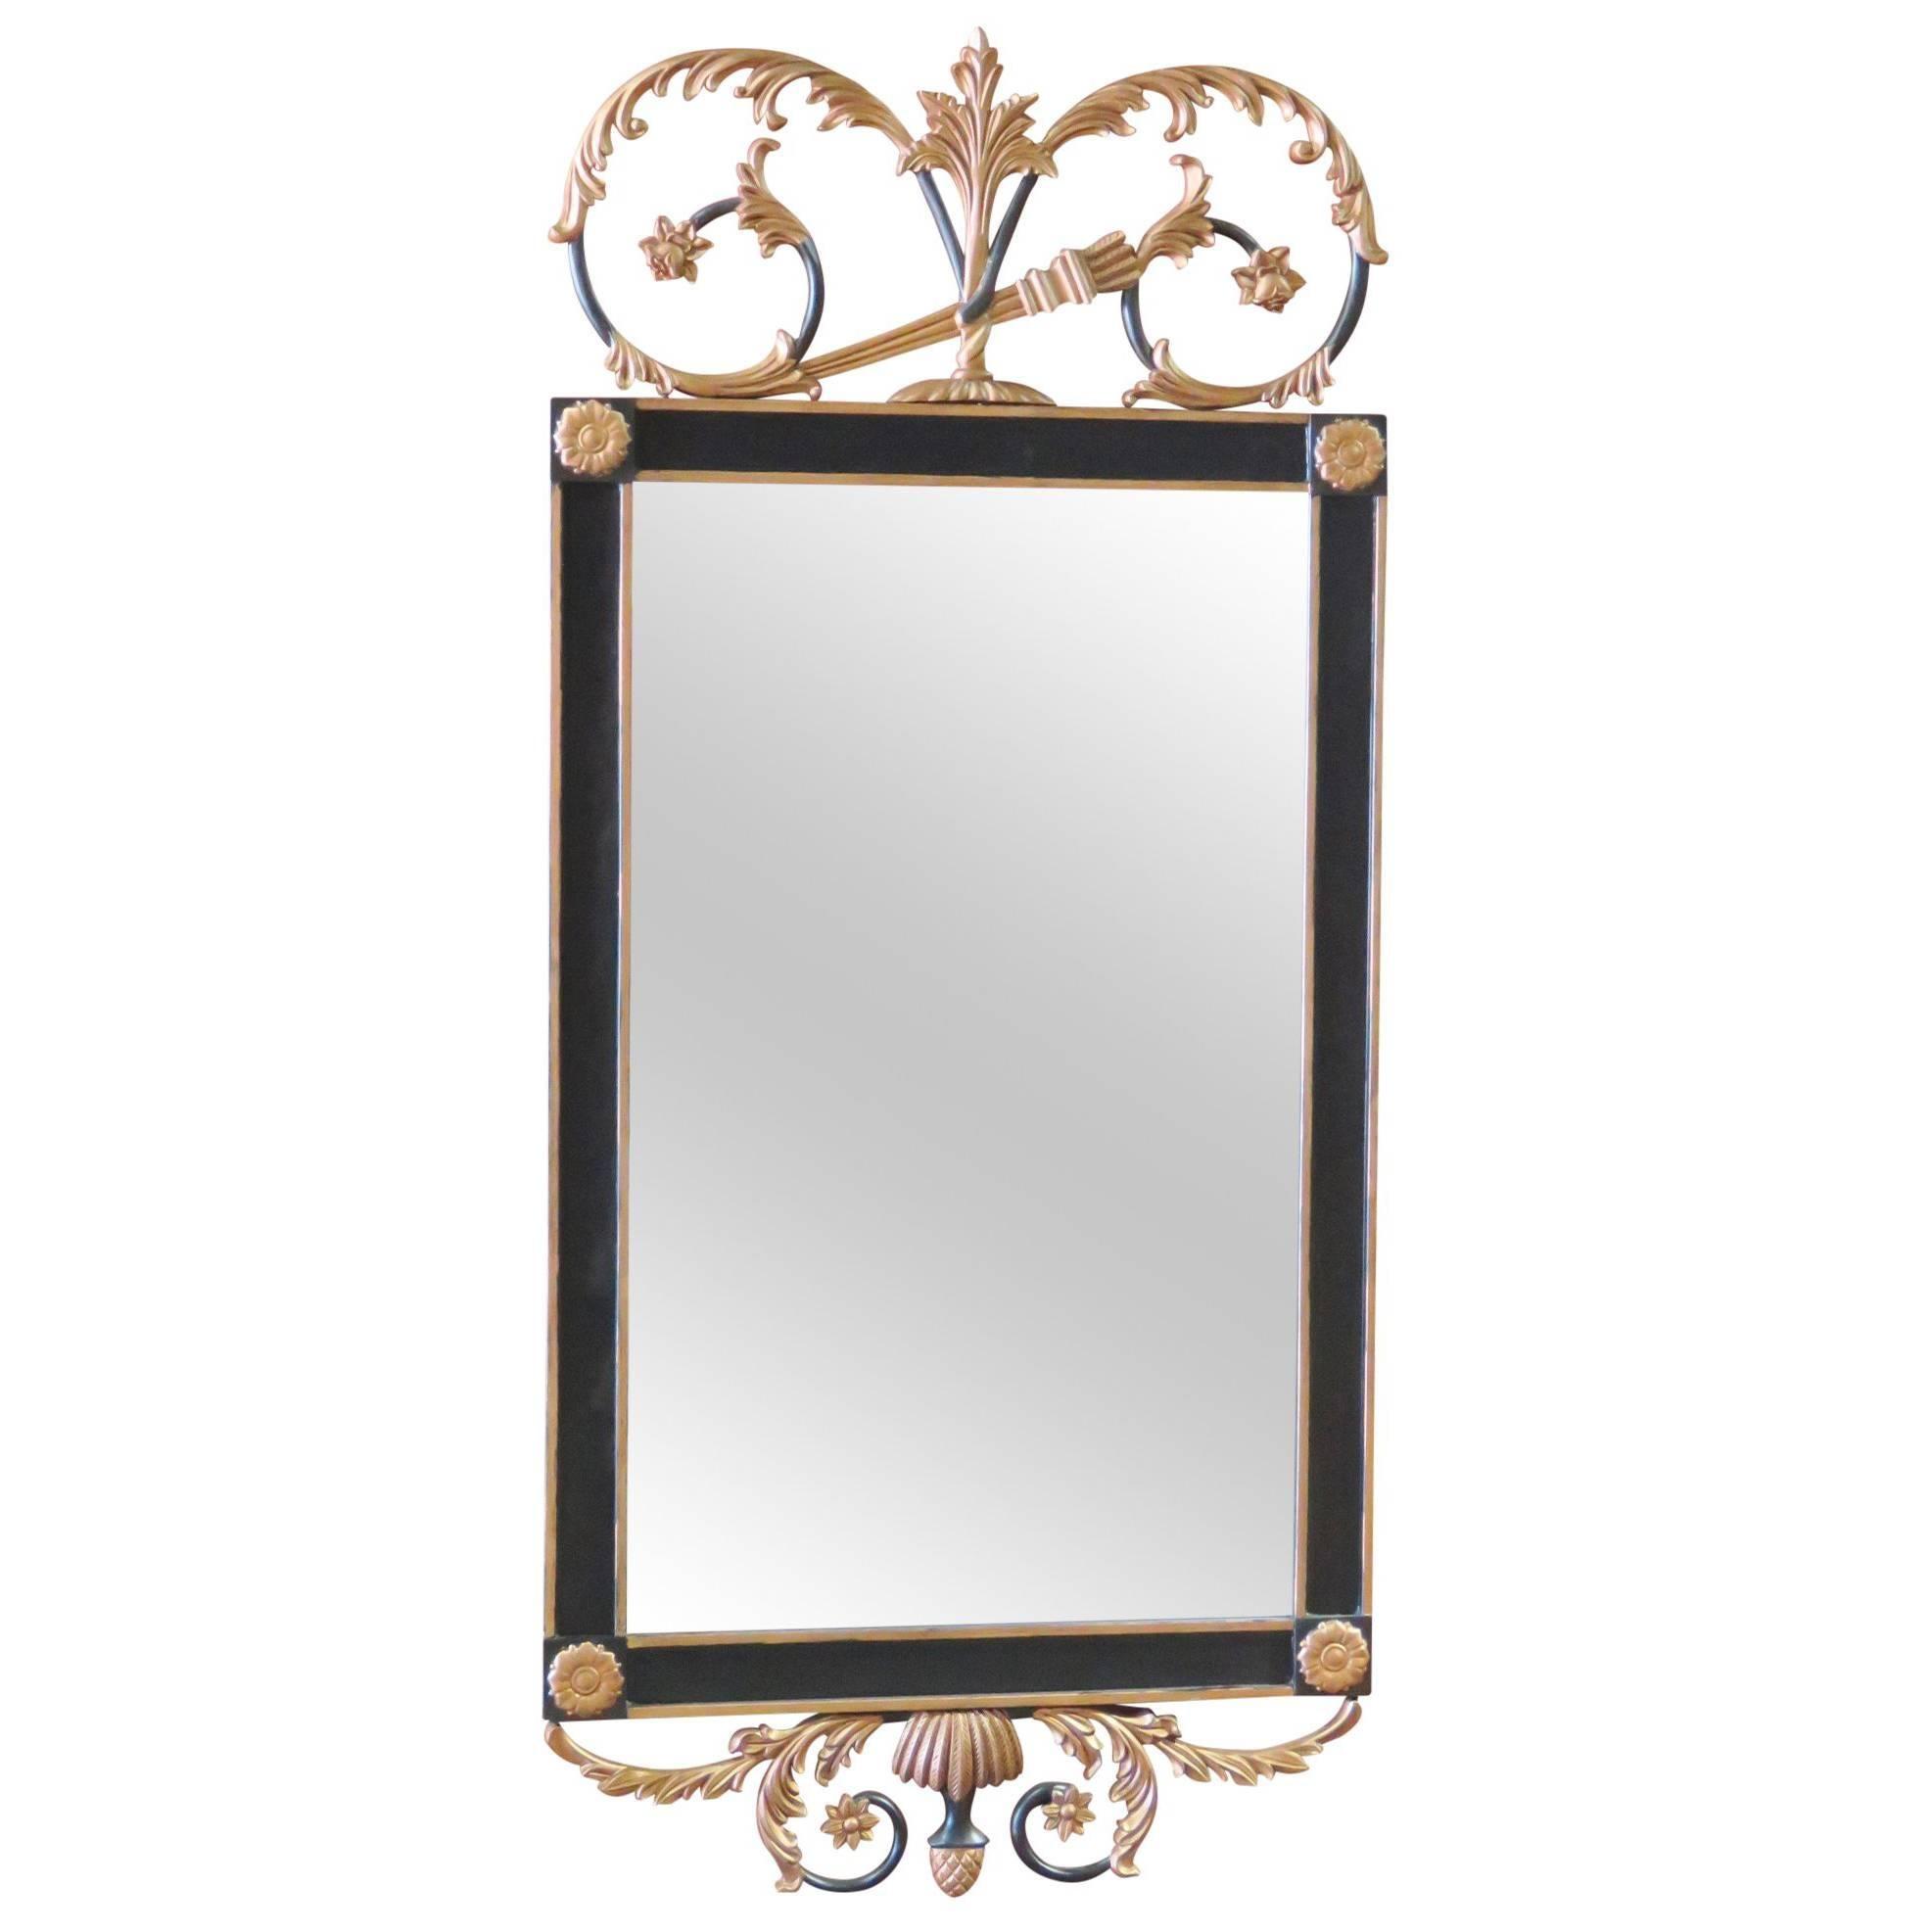 Regency Style Ebonized and Gilt Carved Mirror